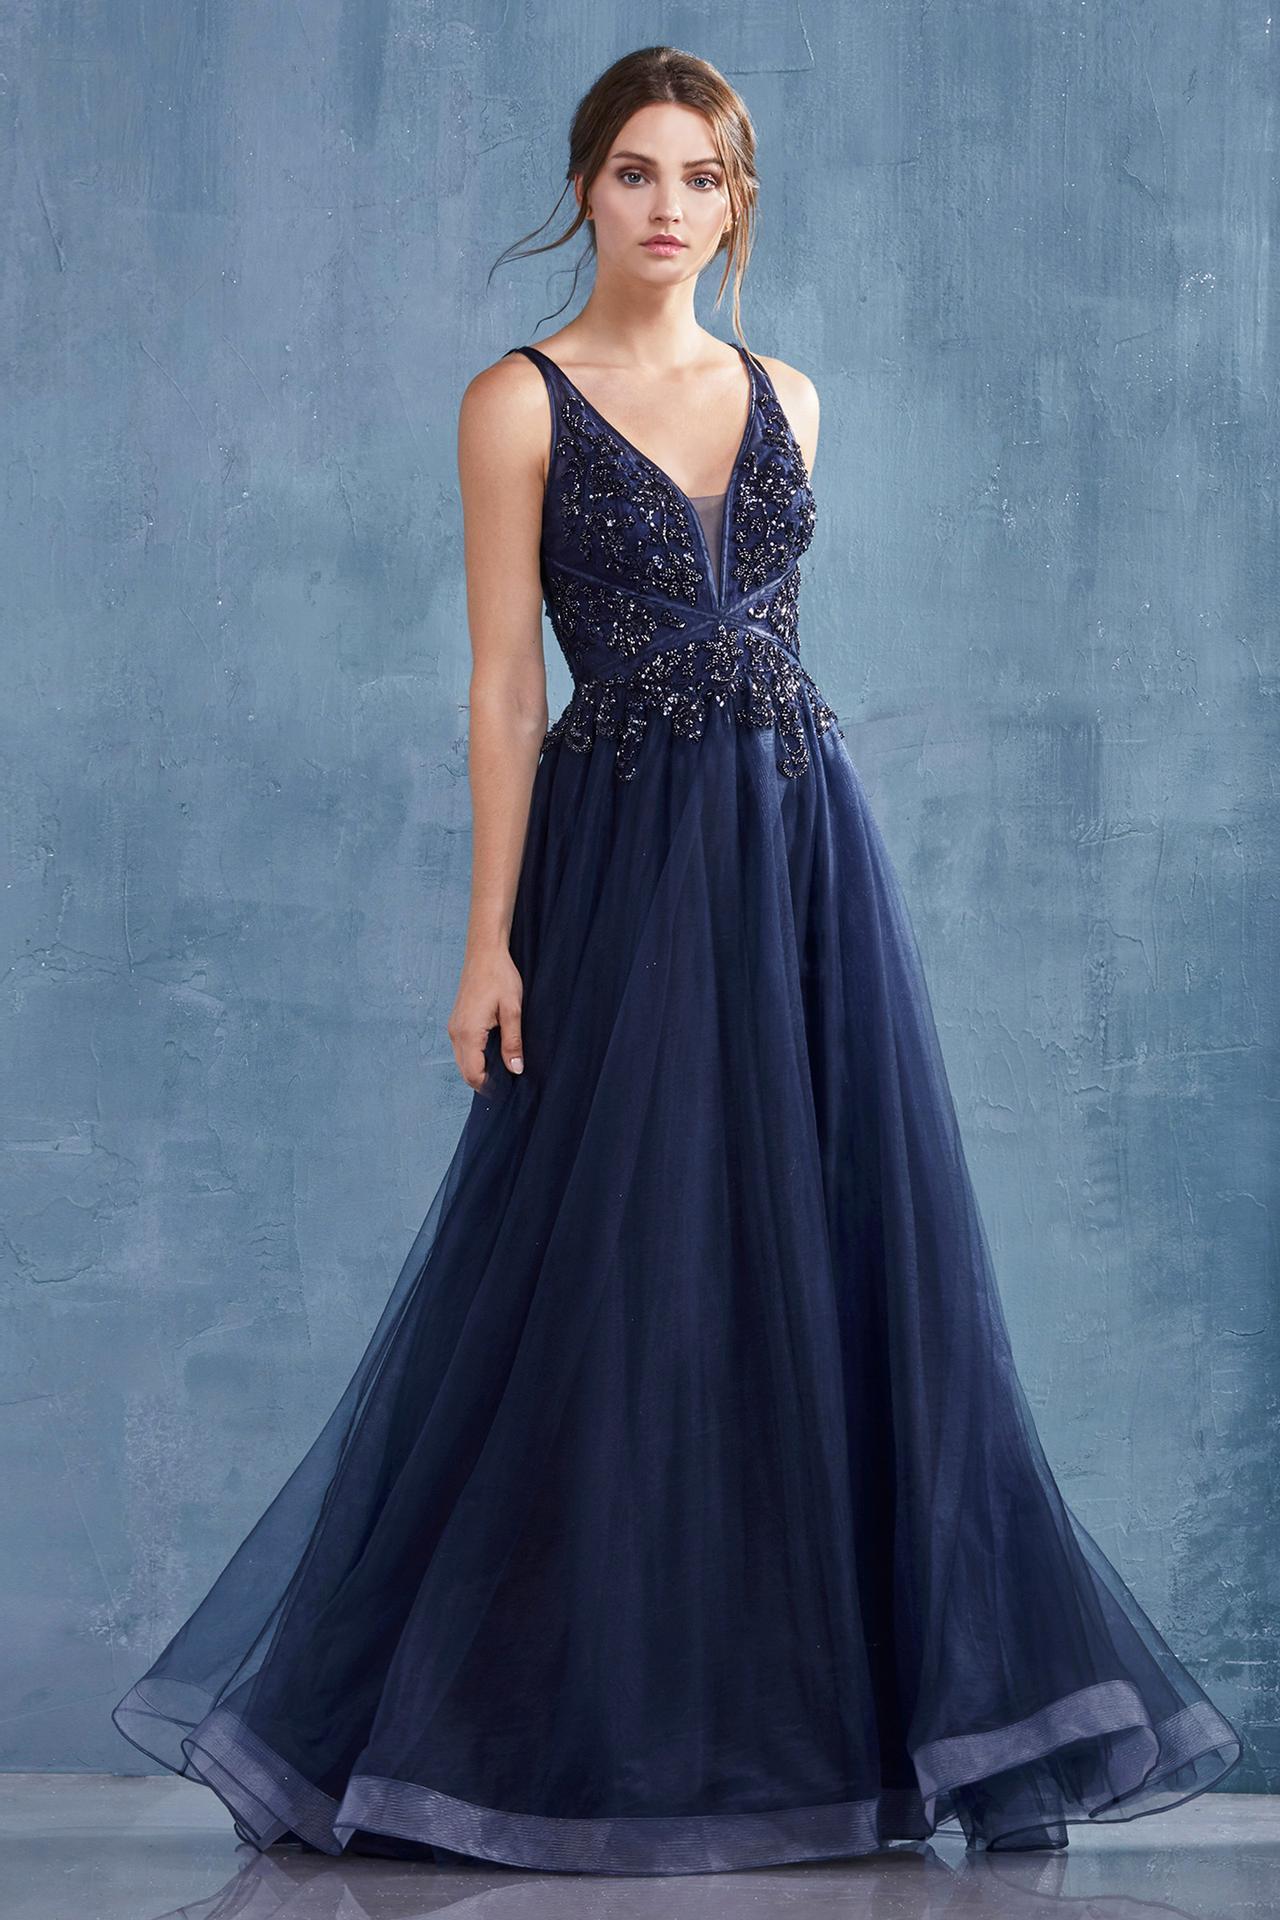 Nové spoločenské šaty :) - Obrázok č. 37